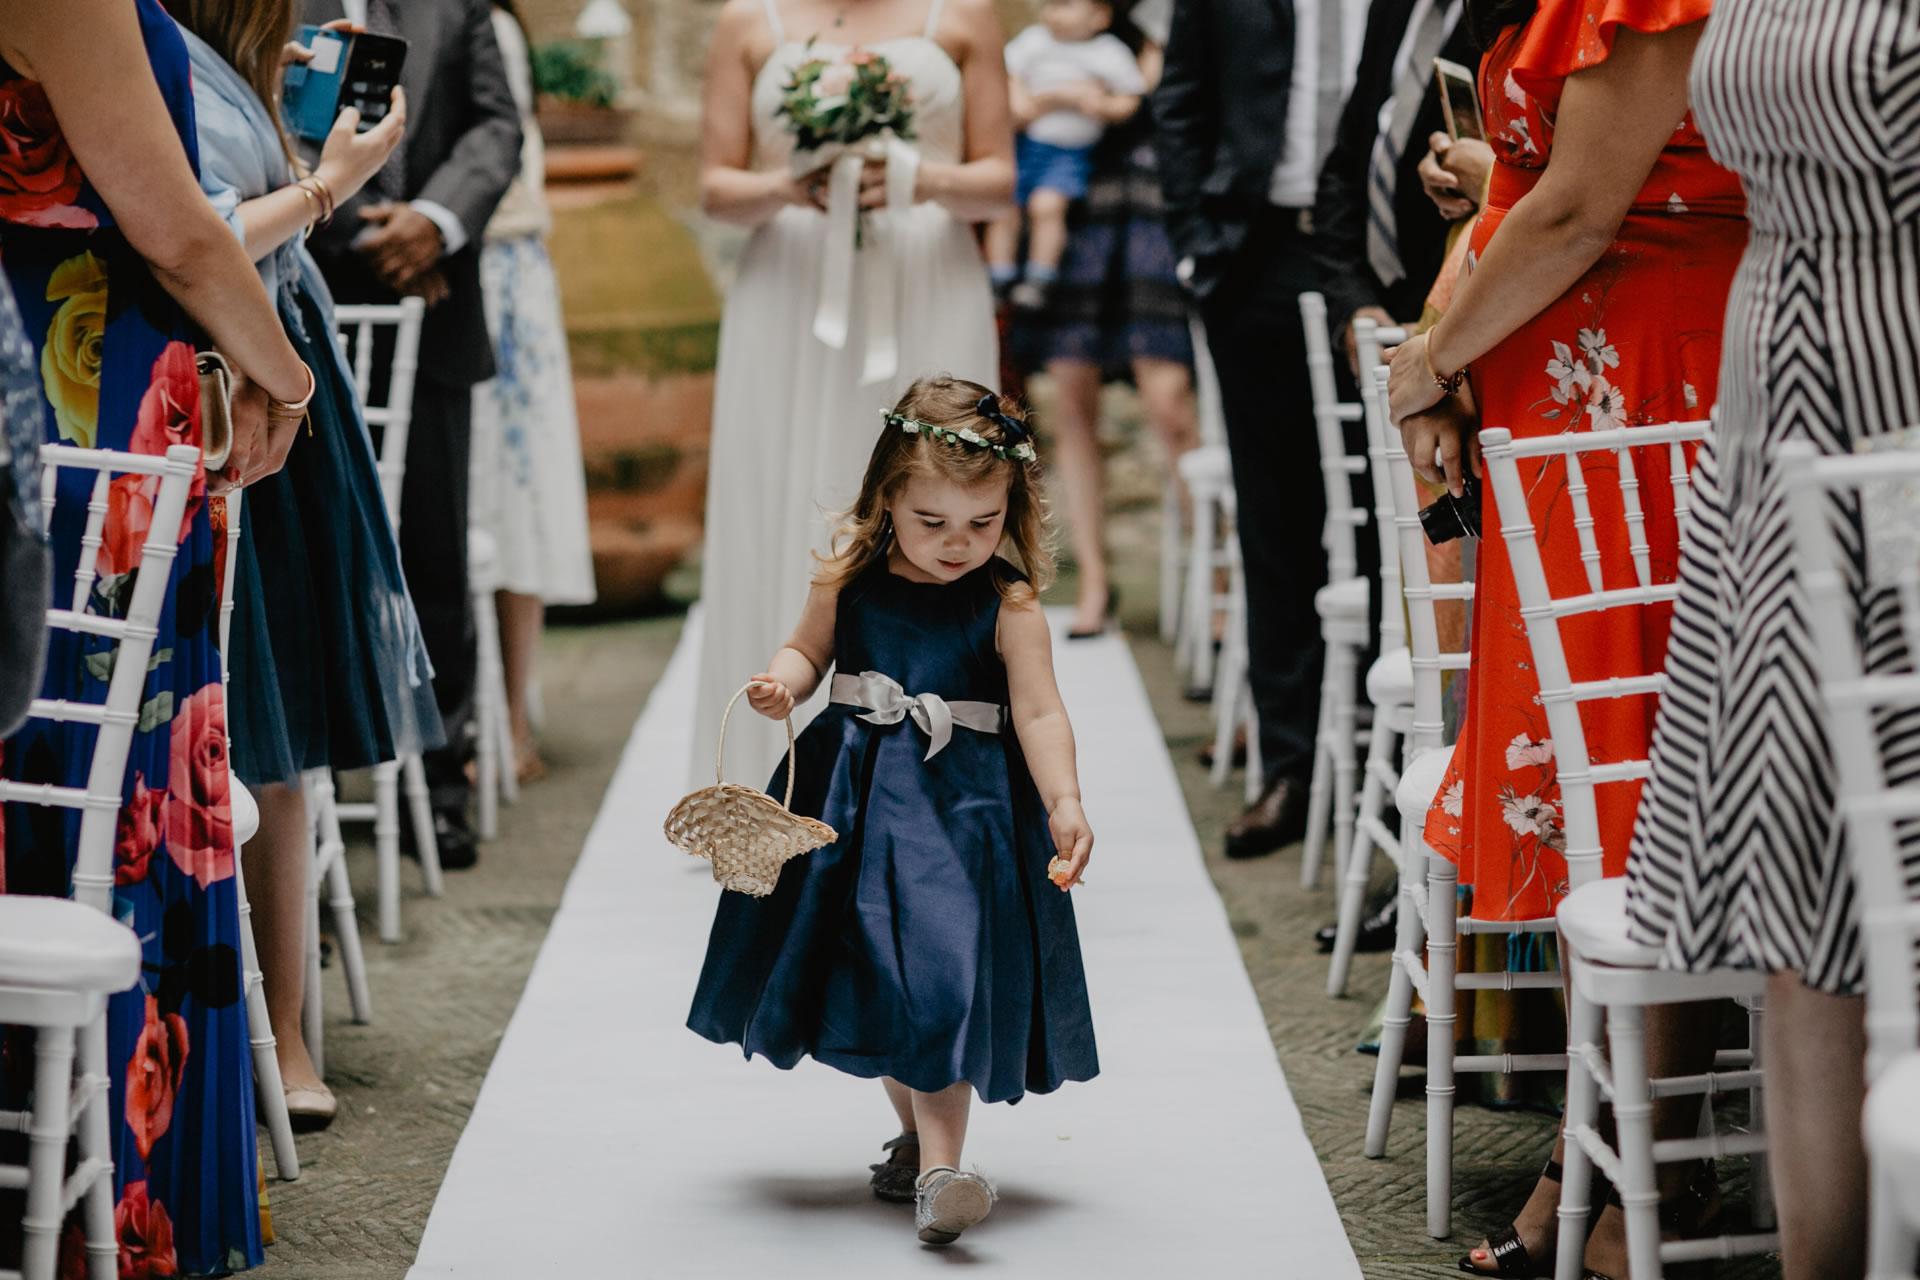 - 44 :: Indian wedding ceremony at Villa Pitiana :: Luxury wedding photography - 43 ::  - 44